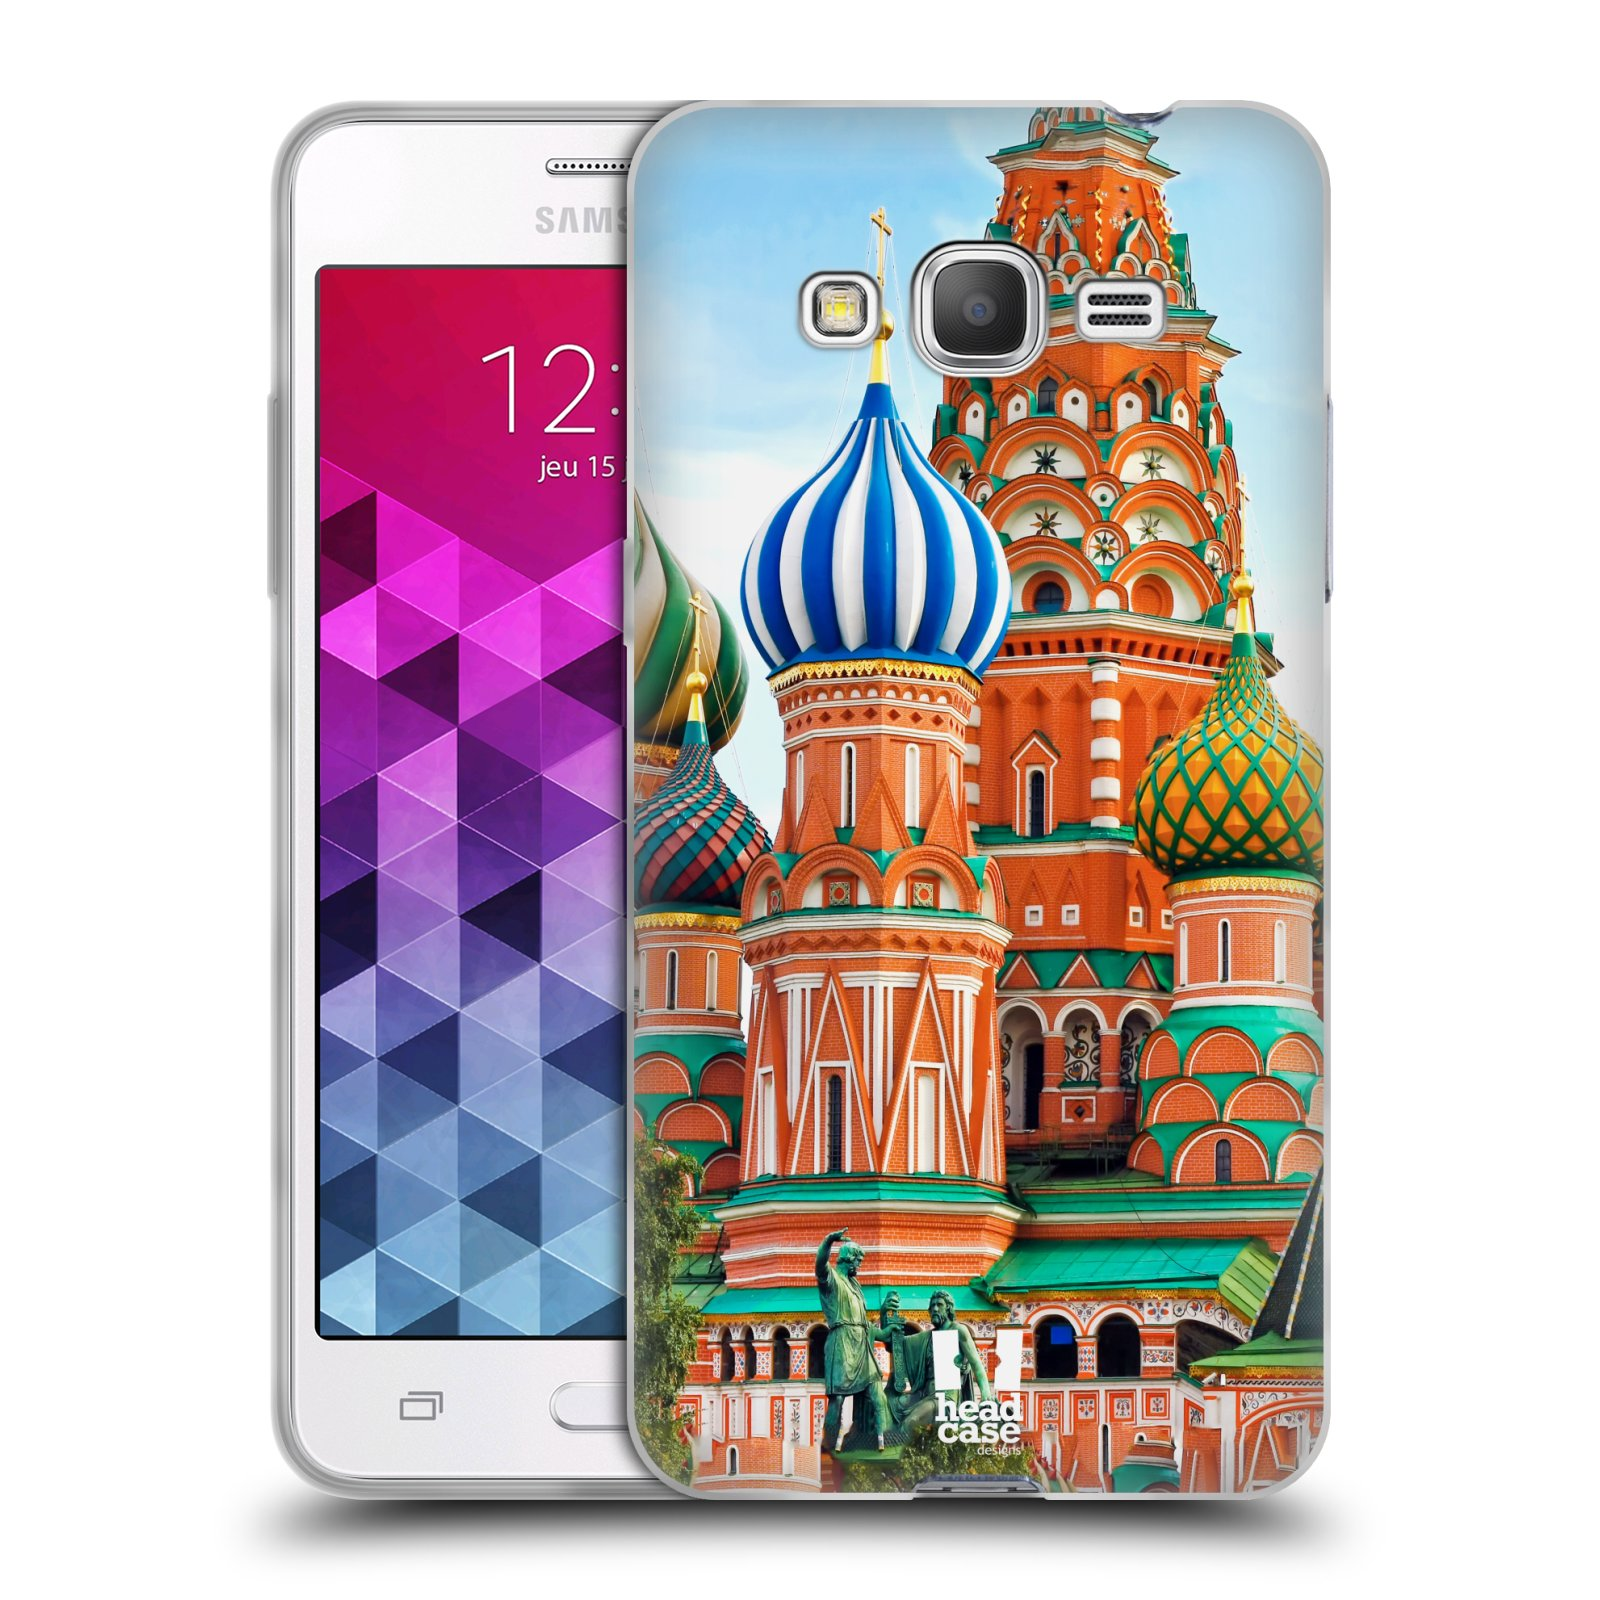 HEAD CASE silikonový obal na mobil Samsung Galaxy GRAND PRIME vzor Města foto náměstí RUSKO,MOSKVA, RUDÉ NÁMĚSTÍ